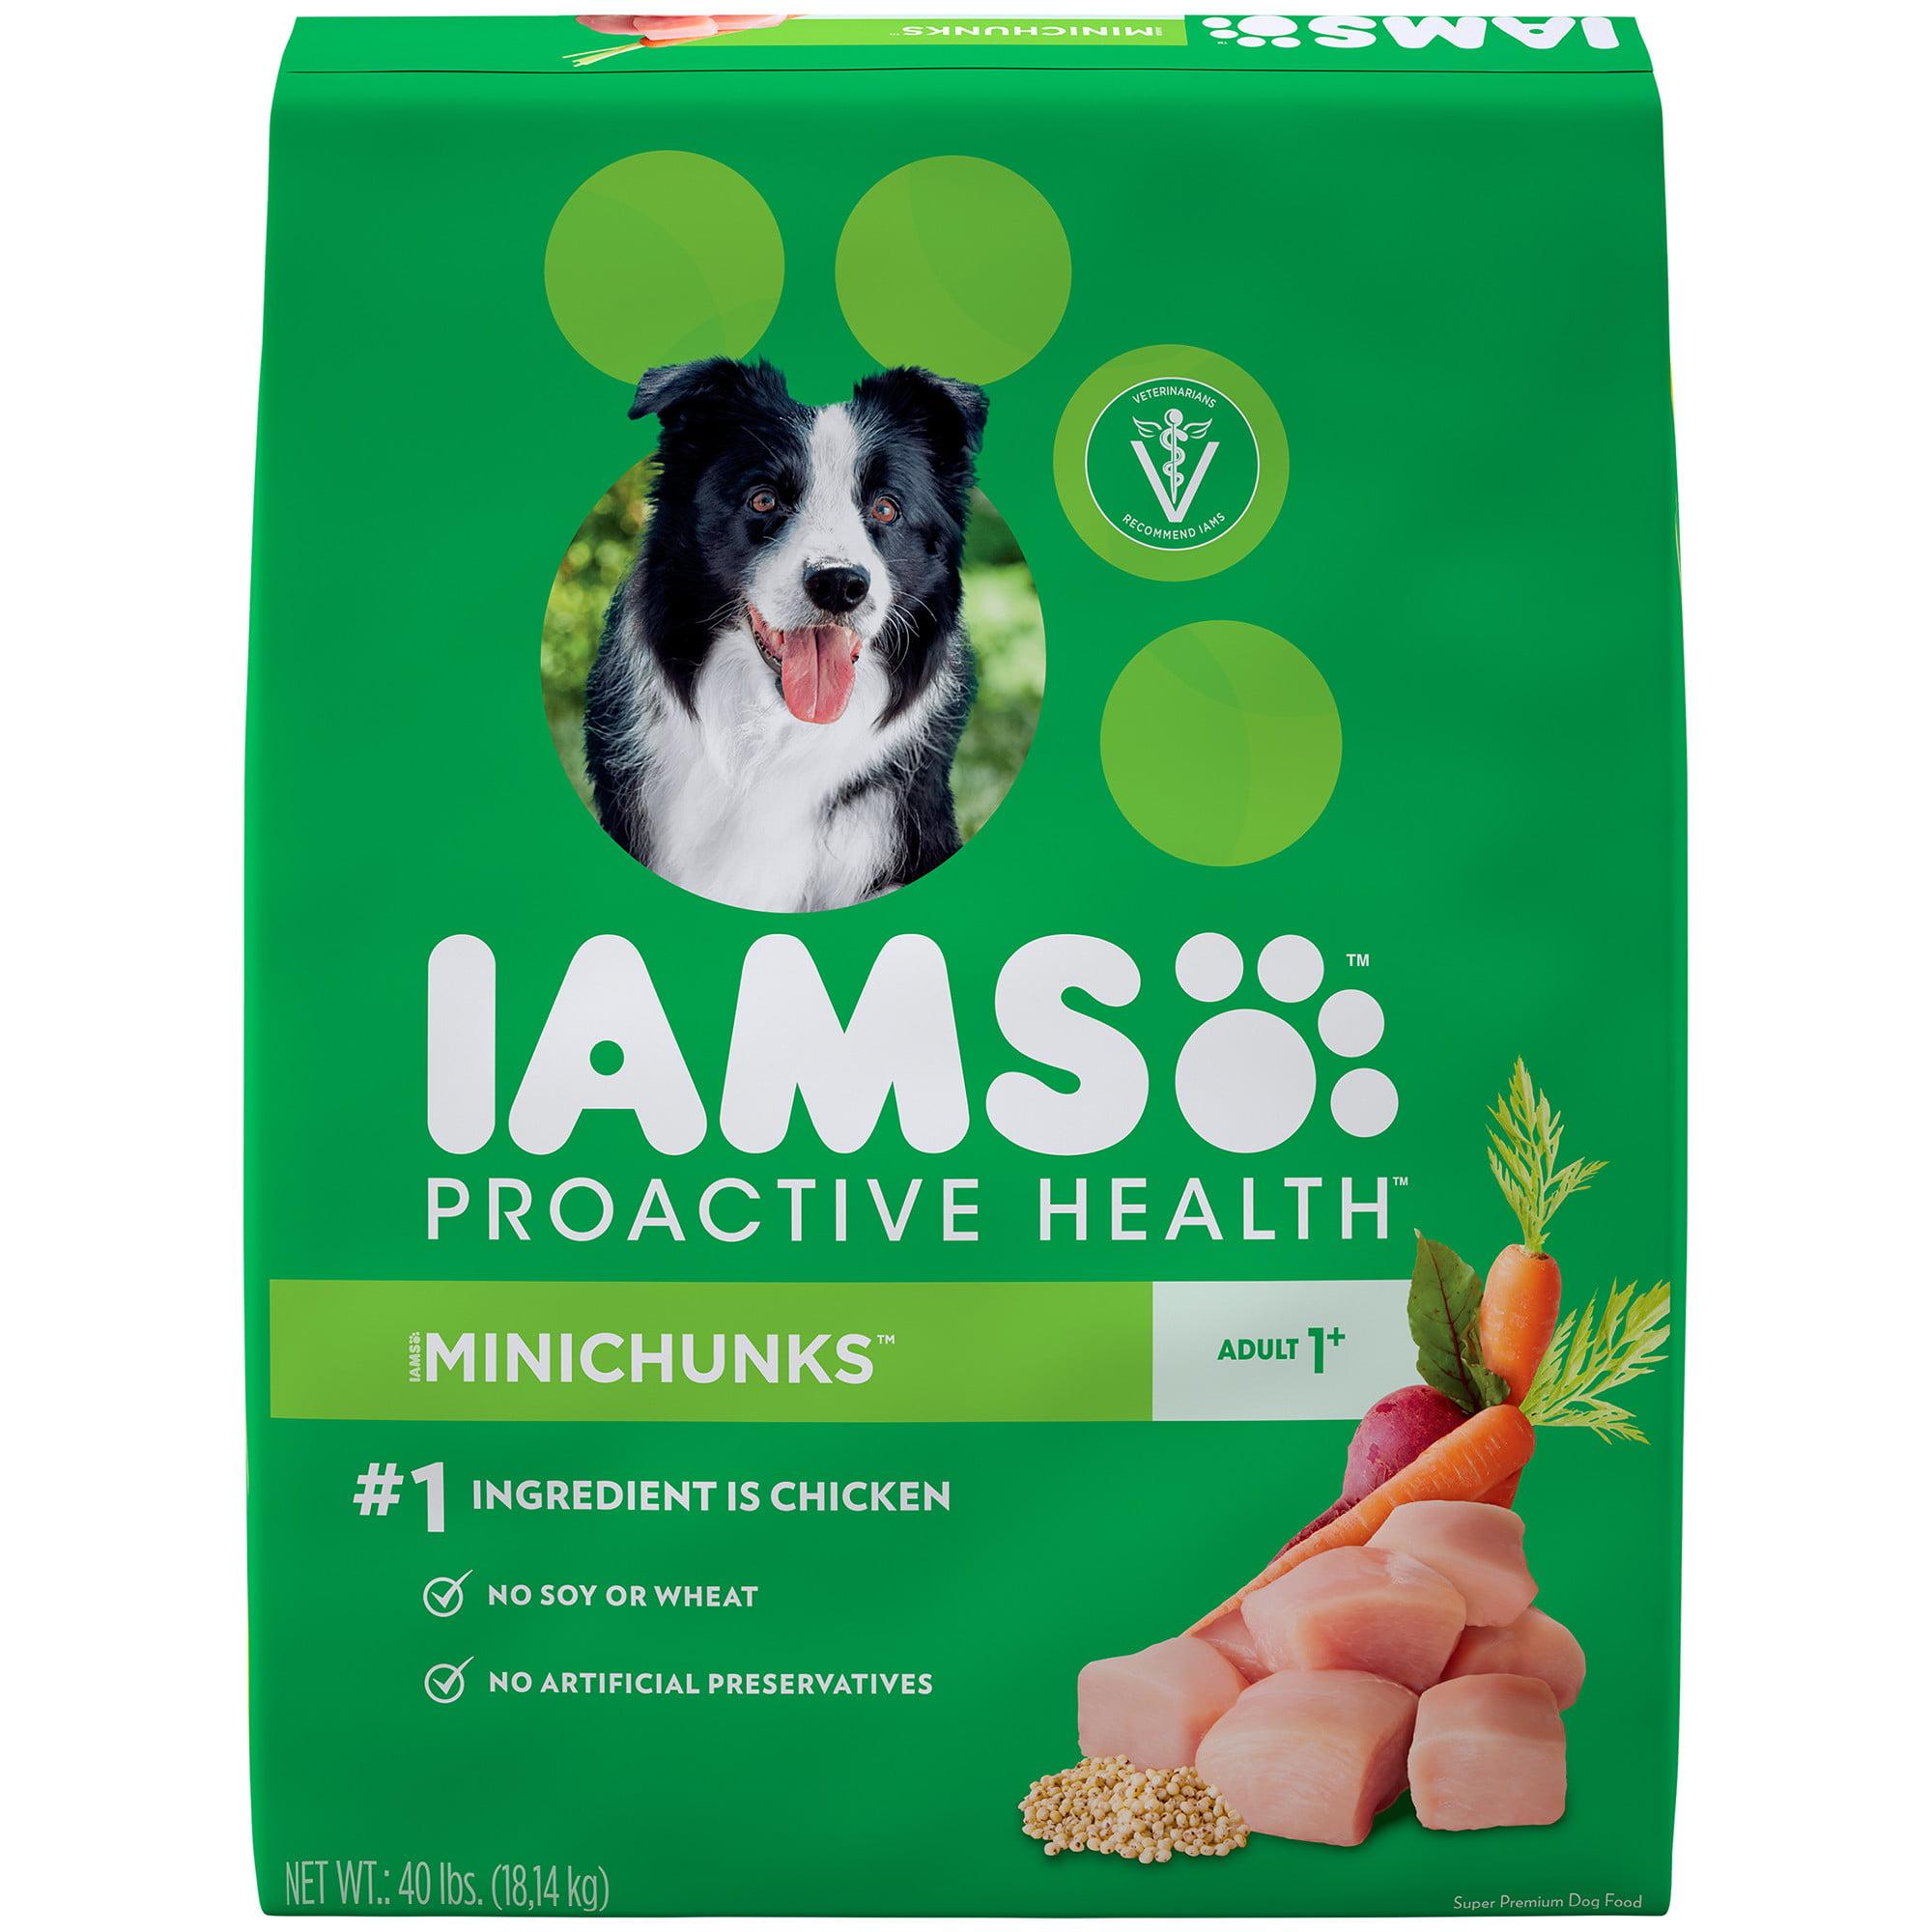 IAMS PROACTIVE HEALTH Adult Minichunks Dry Dog Food Chicken, 40 lb. Bag by Mars Petcare